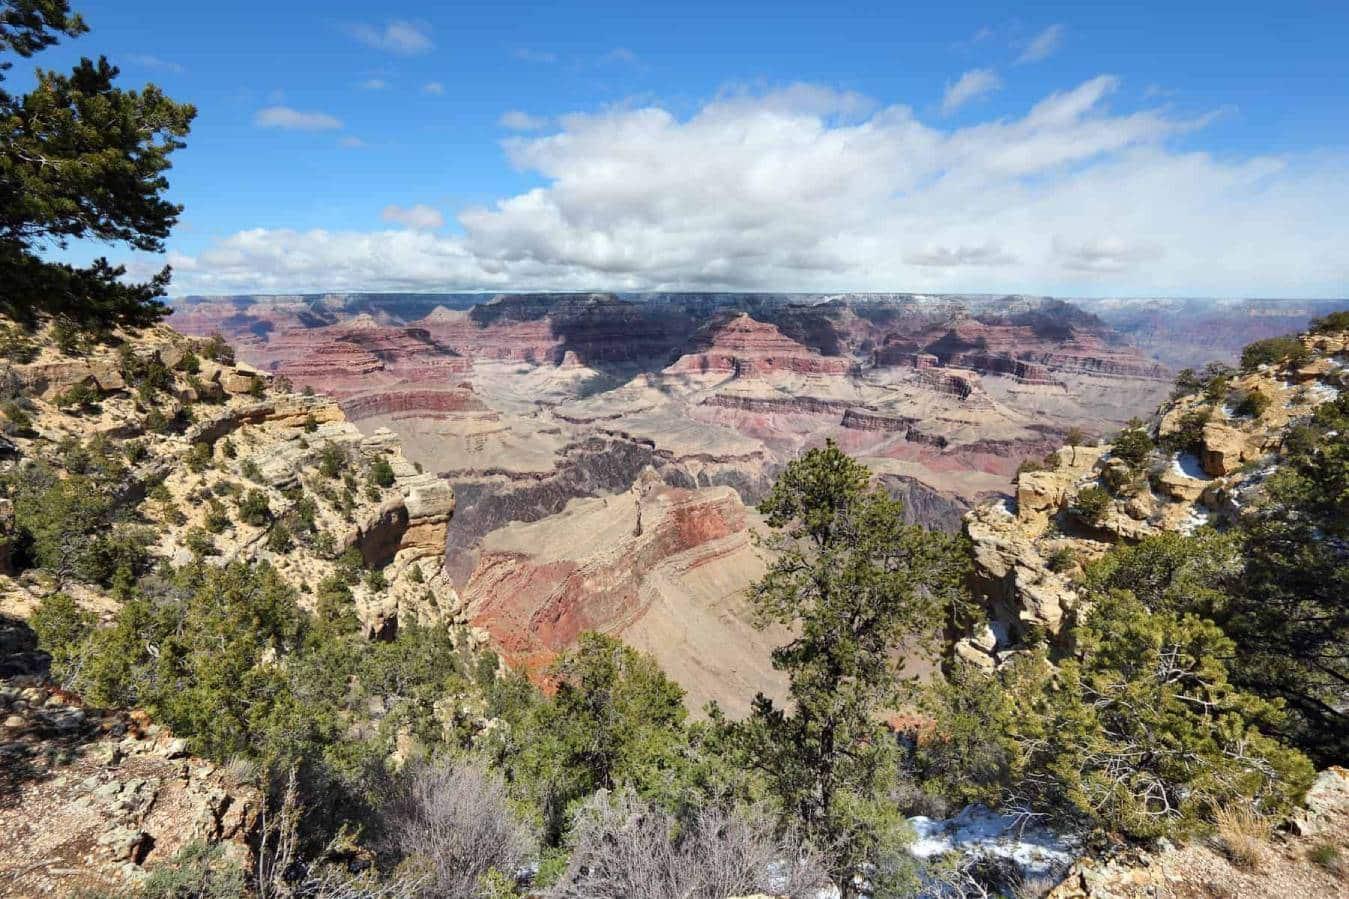 Grand Canyon National Park in Arizona, United States. The beautiful Yavapai Point overlook.